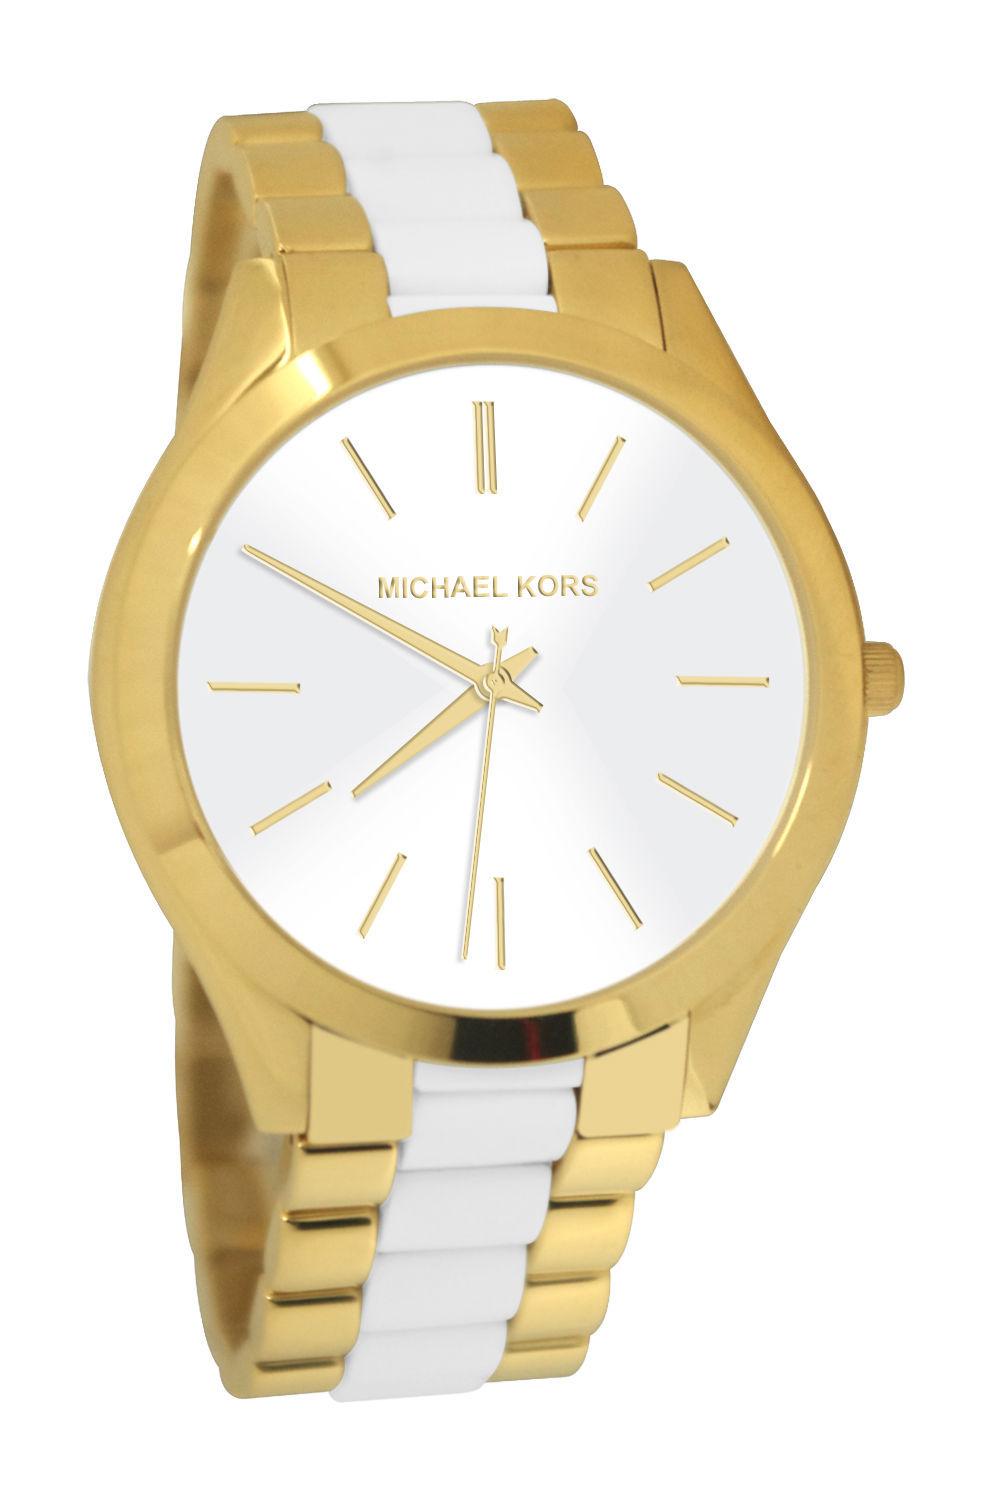 a5c1266cabf5 new + box women s MICHAEL KORS Slim Runway MK4295 White   Gold Tone Steel  WATCH